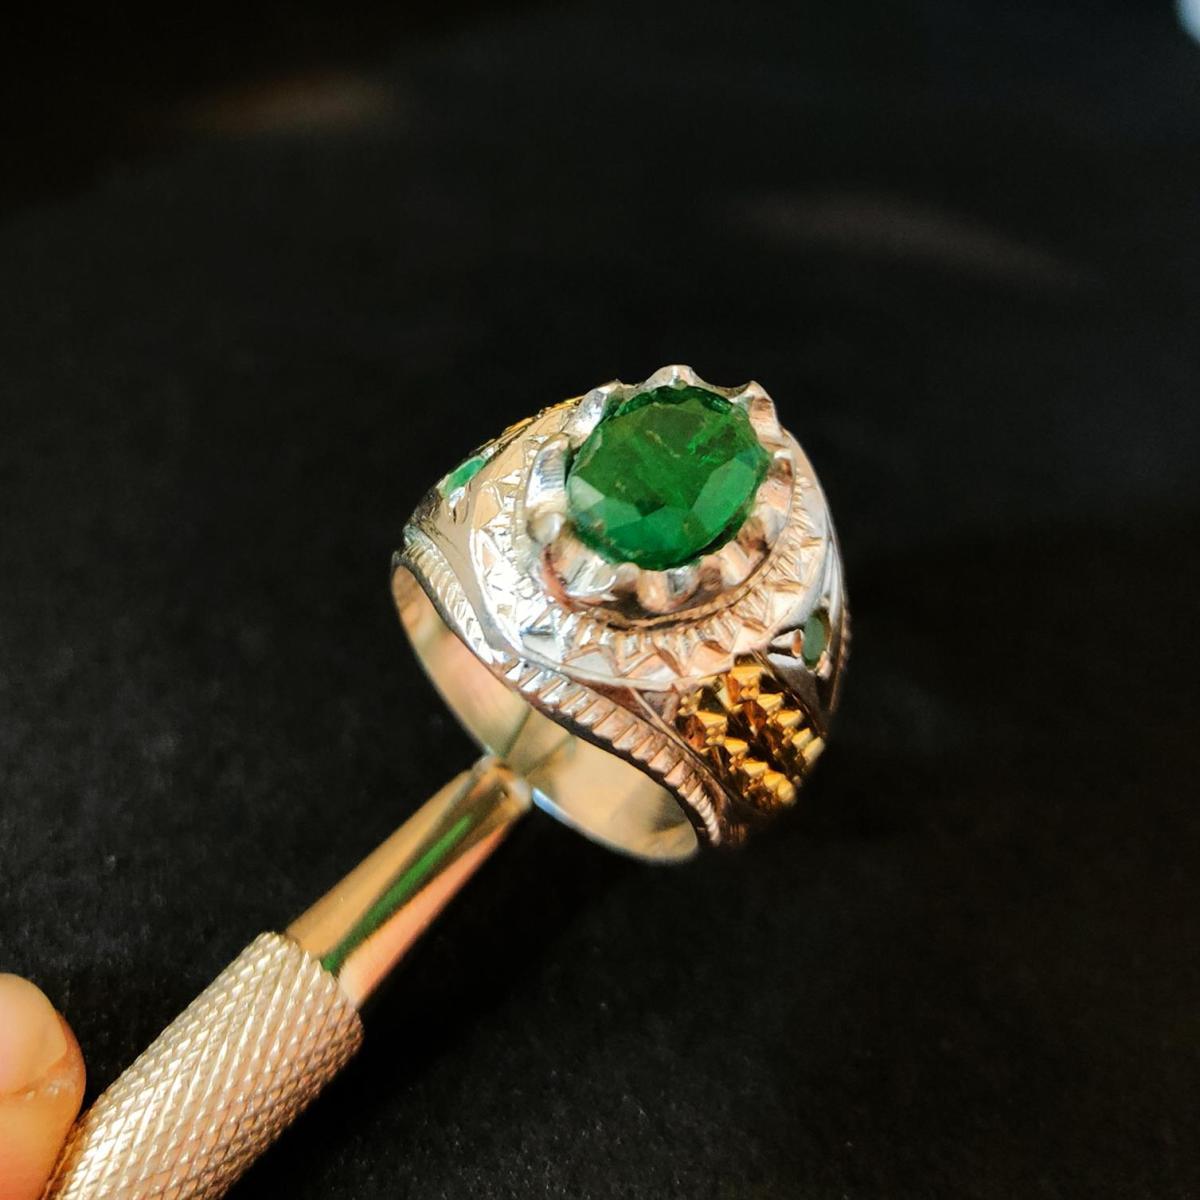 Natural Emerald Ring Handmade 925 Silver Zambian Emerald Zamurd Ring 11 natural gemstones pakistan + 925 silver jewelry online